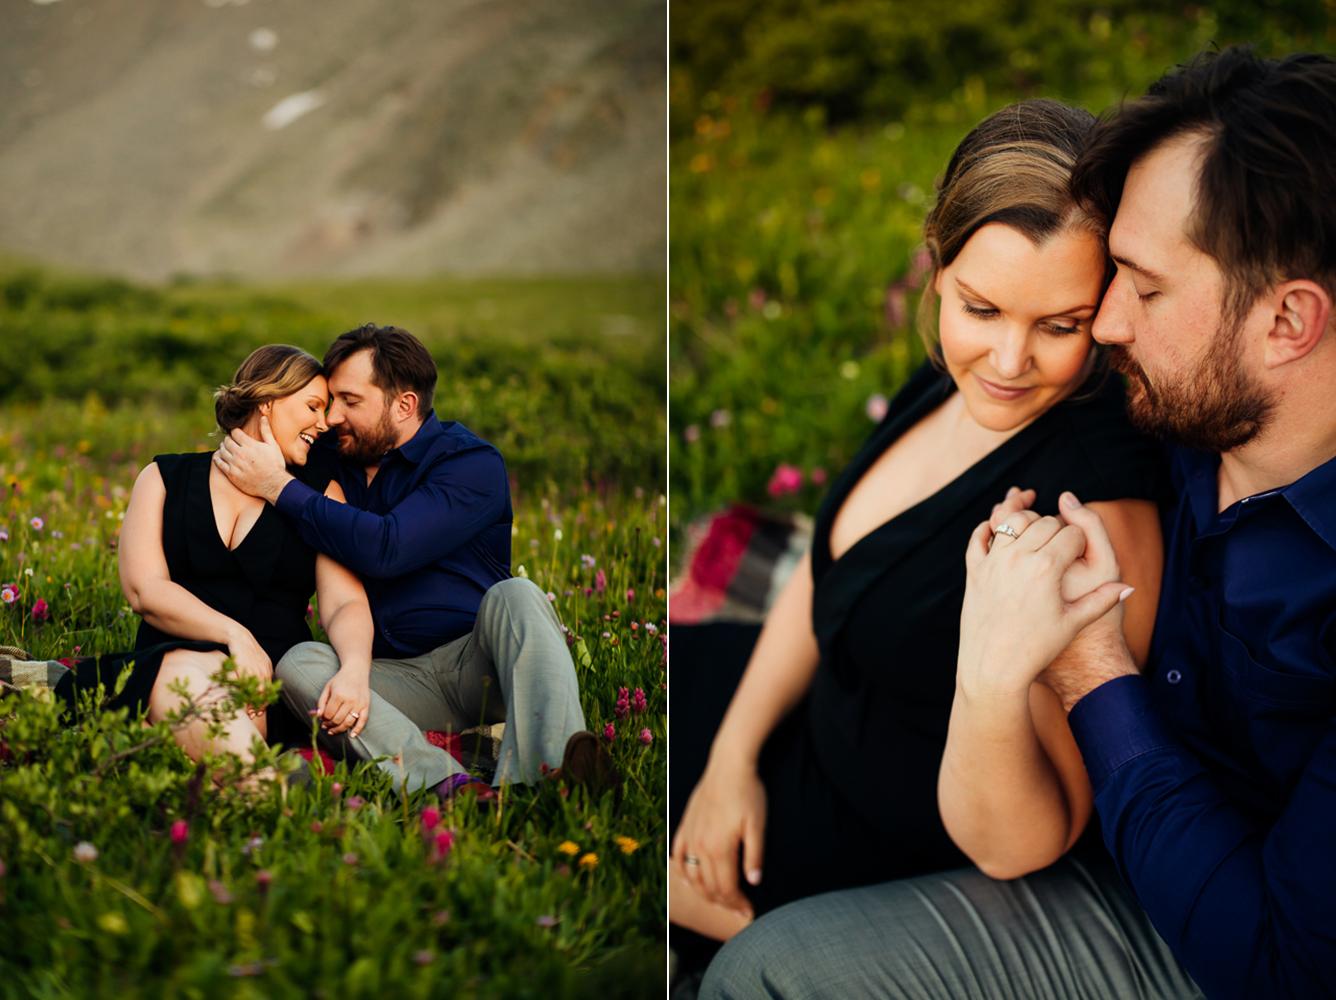 Summer breckenridge engagement session -65.jpg